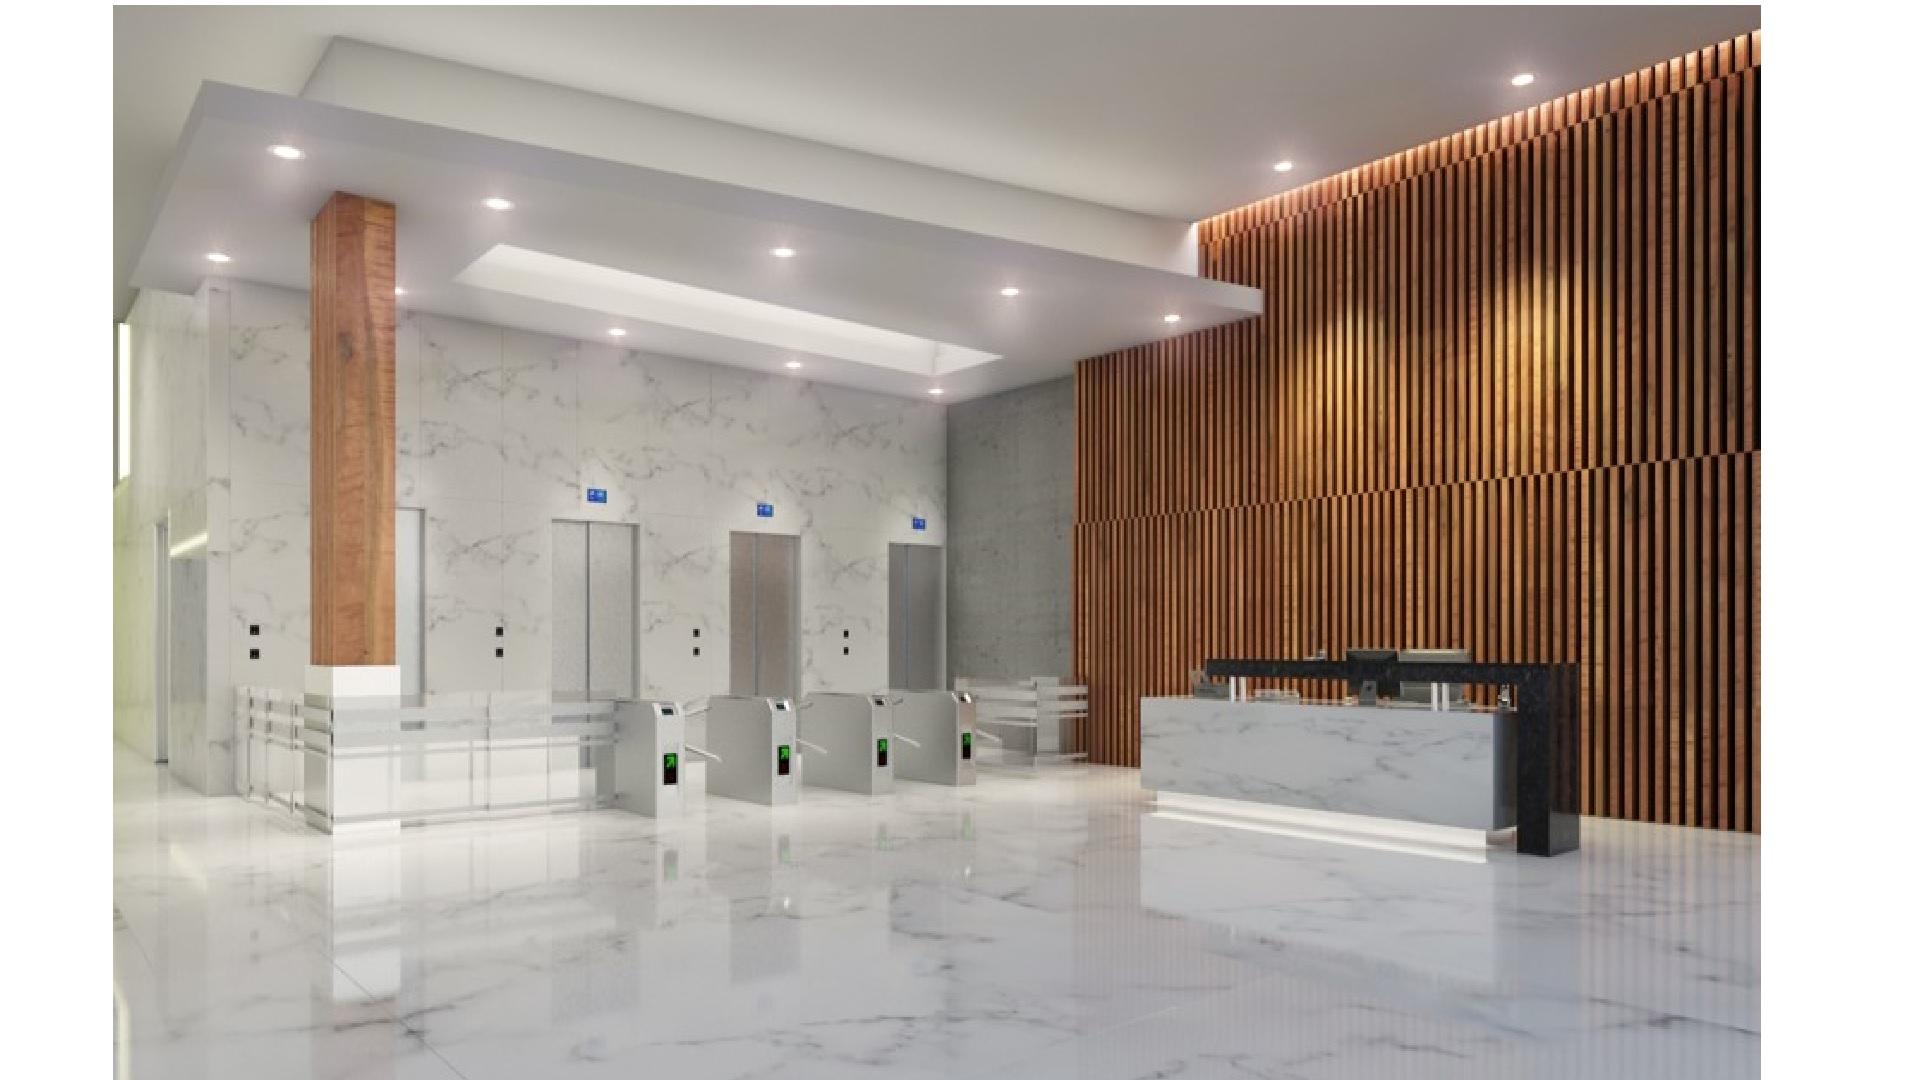 Lobby Atlantic Oficinas barranquilla 2 w